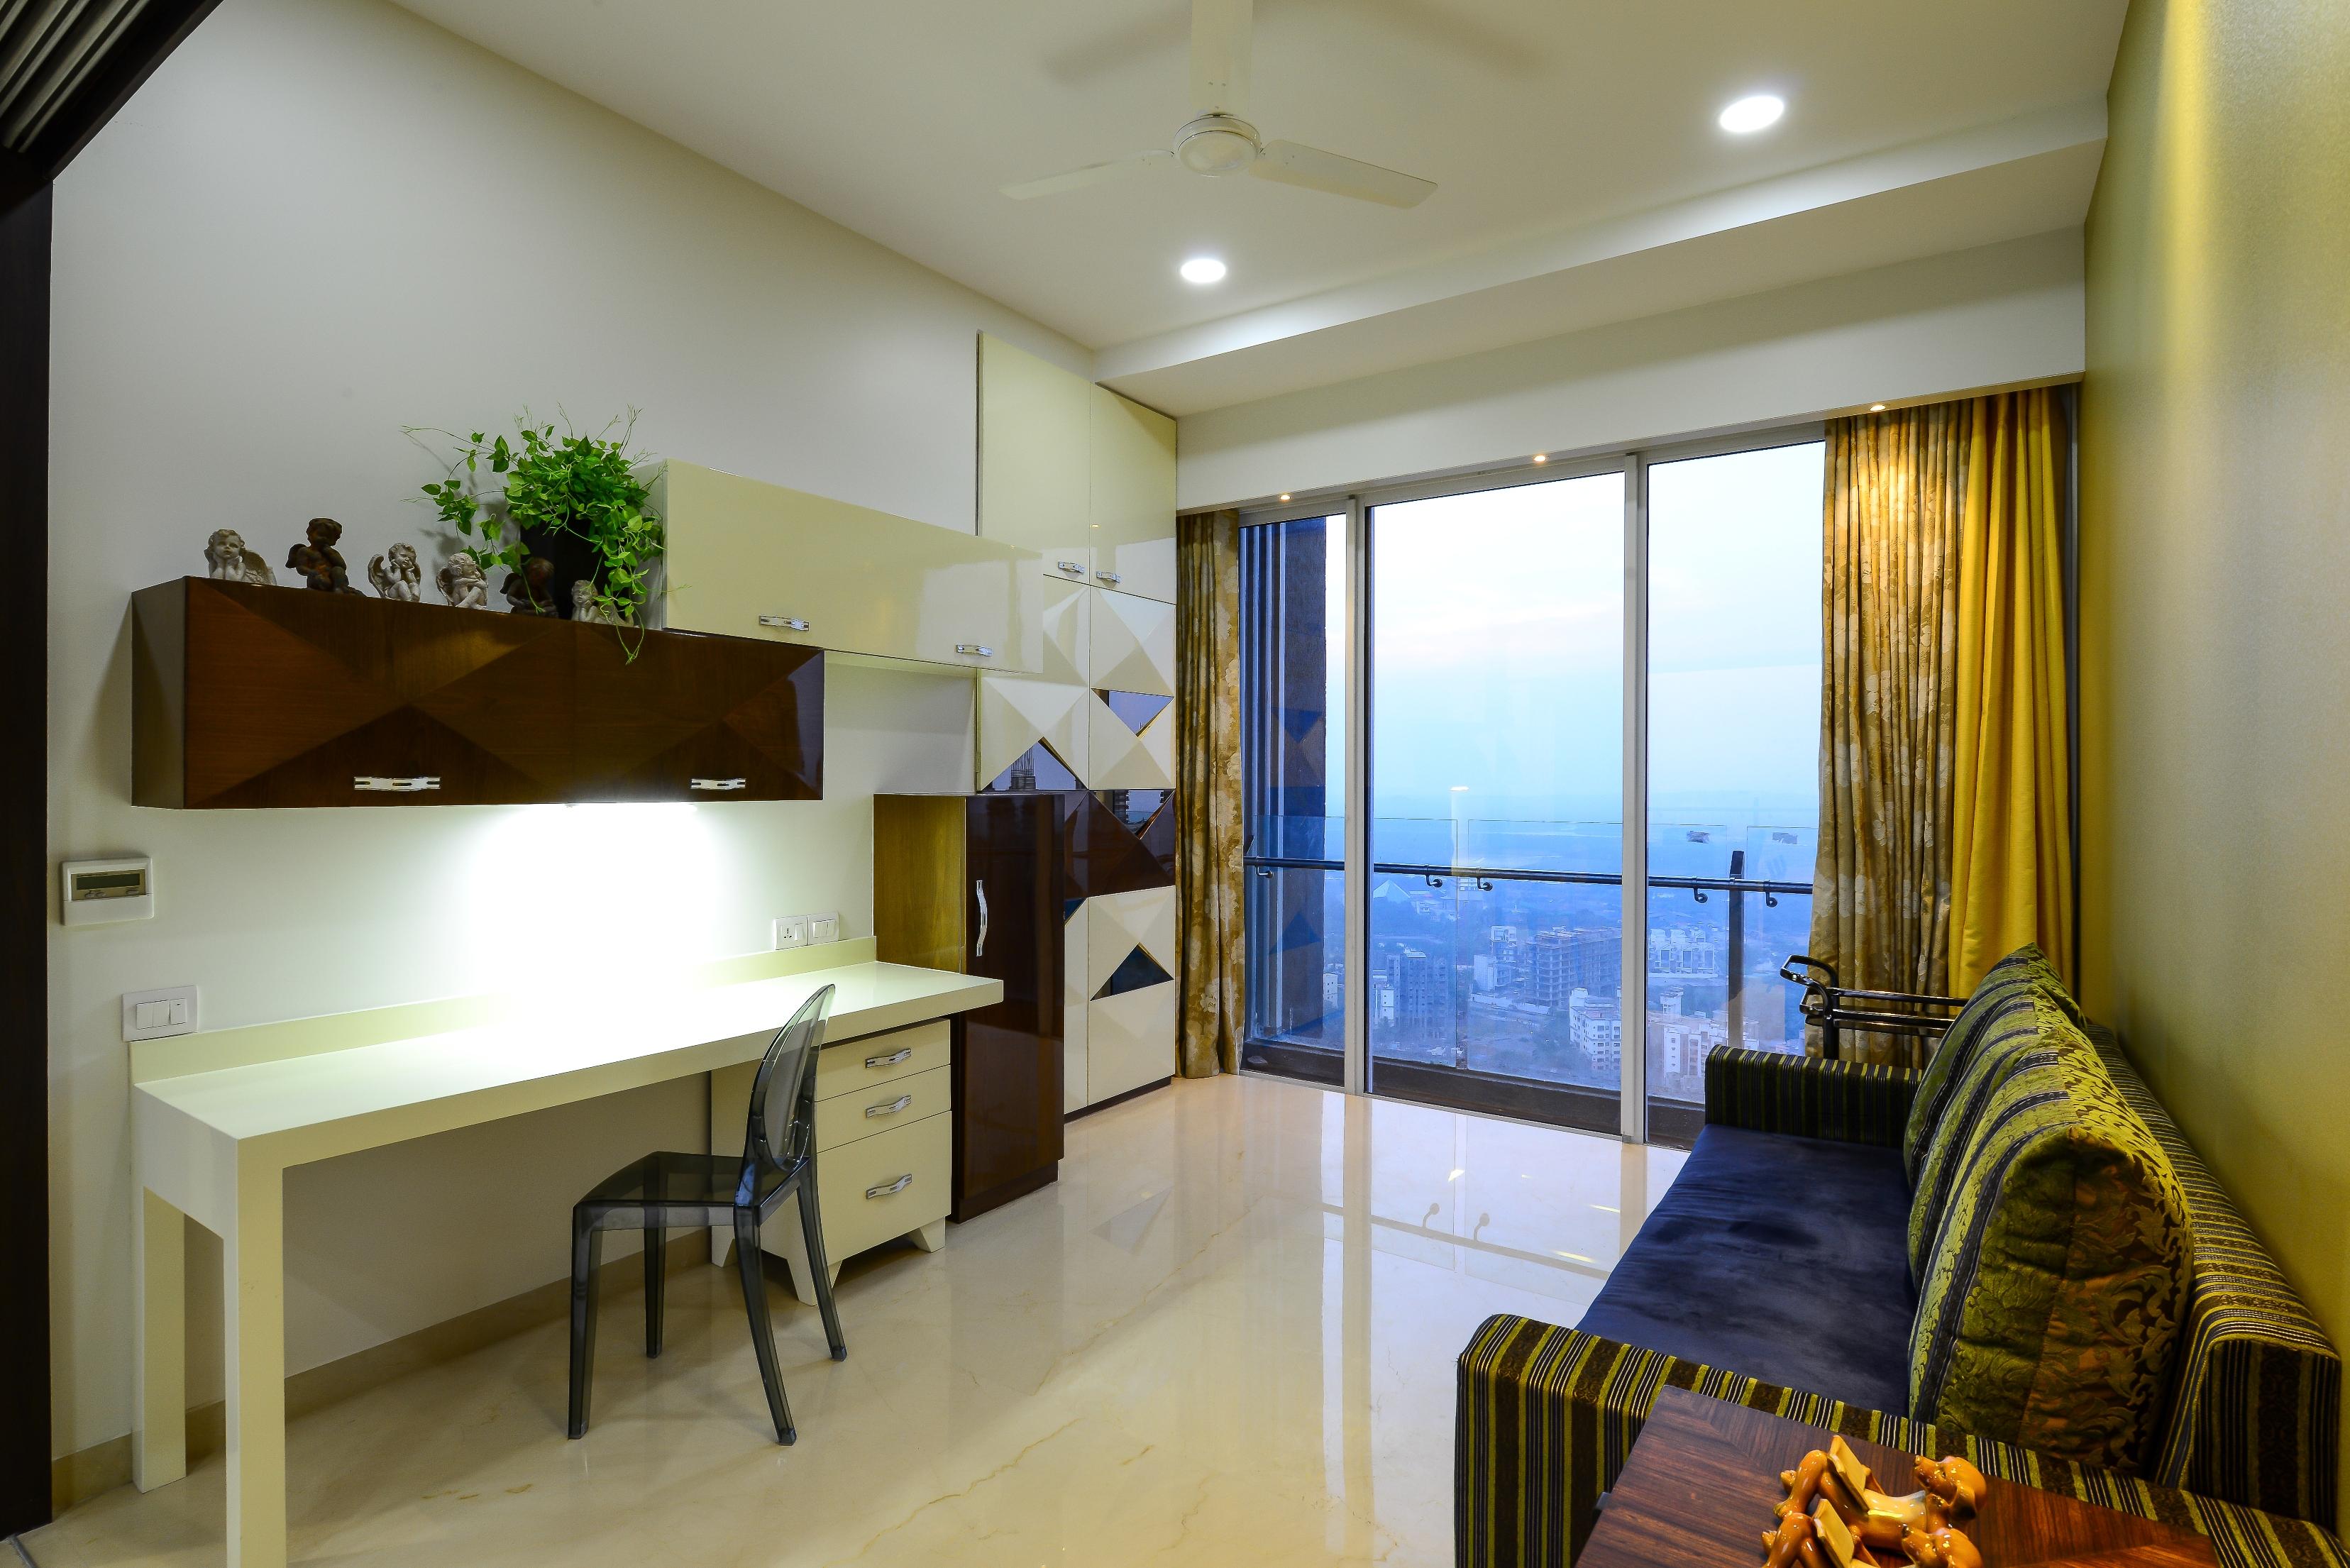 Design of a study room by architecture design art pvt ltd Architectural design ltd